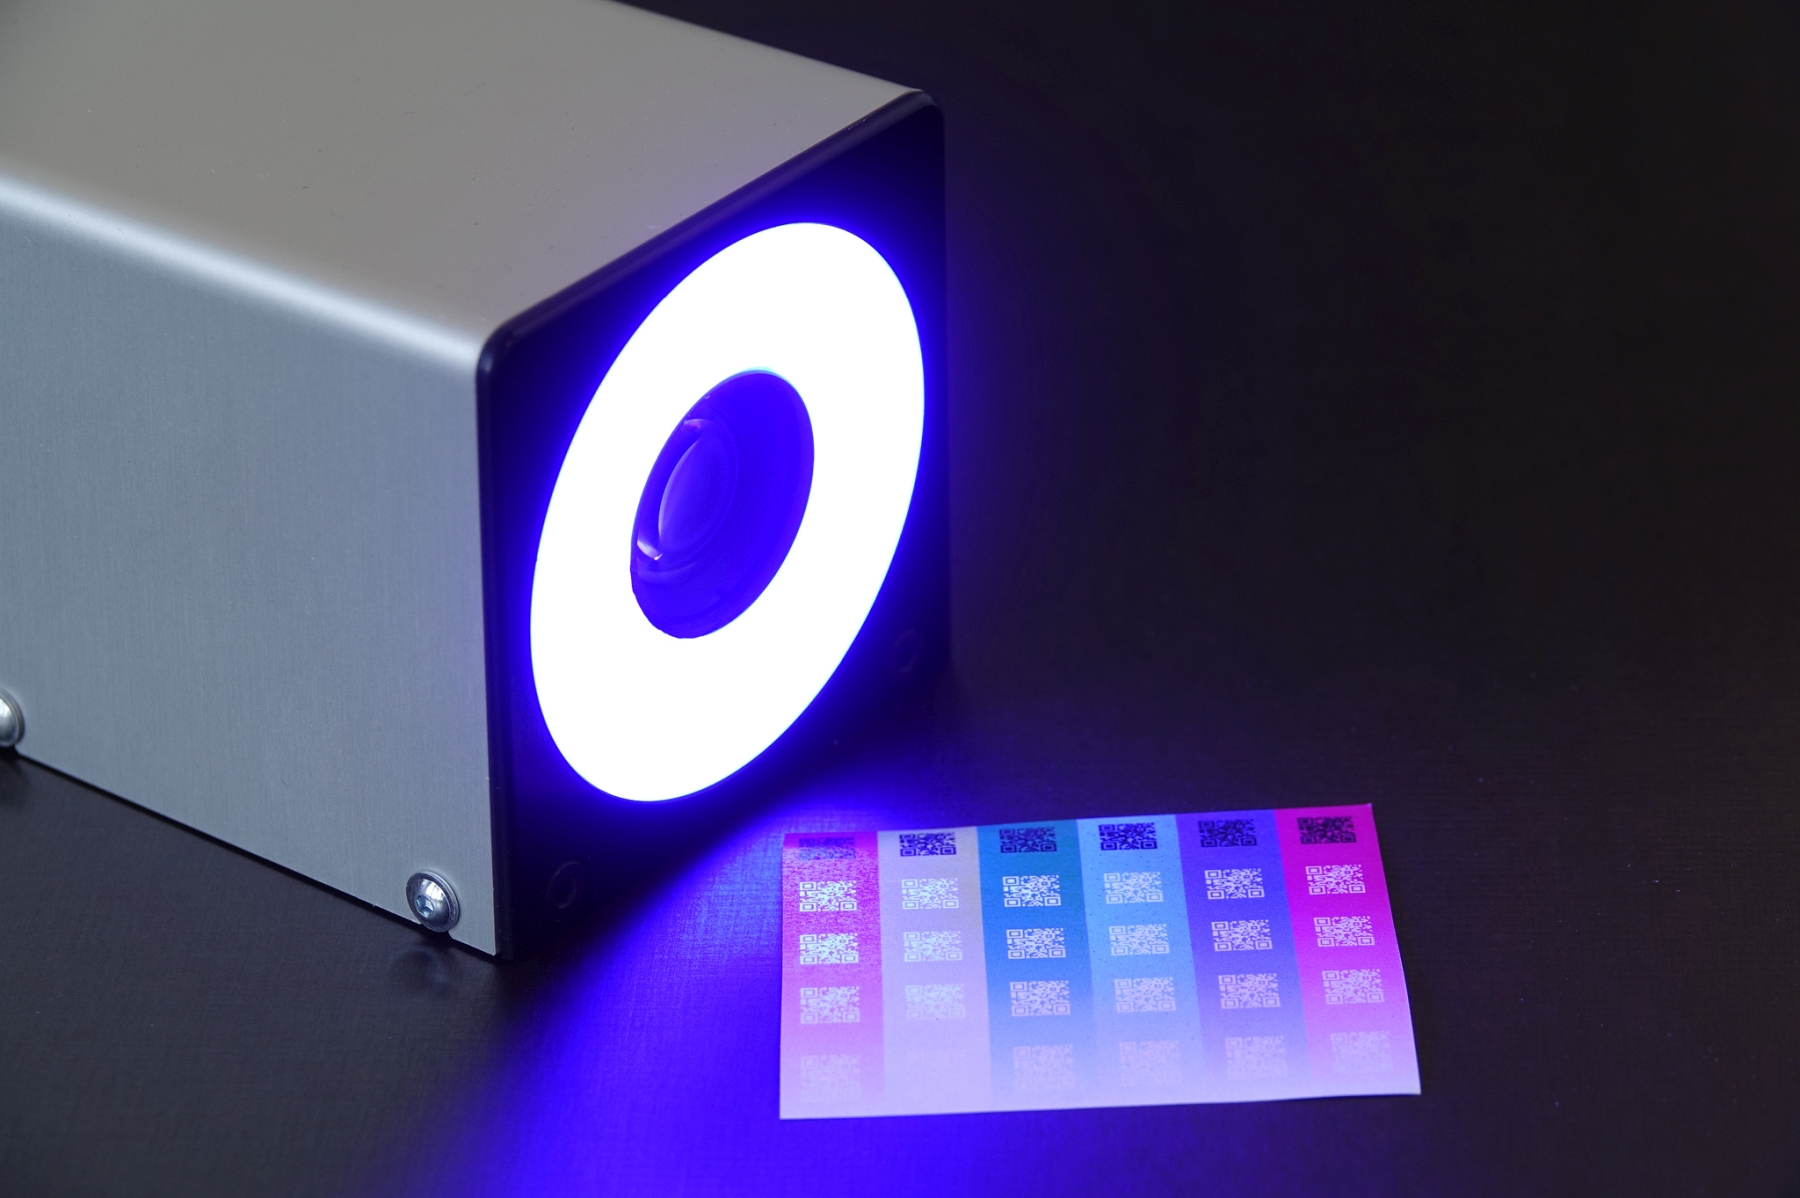 Visionsystem mit RGB-Beleuchtung